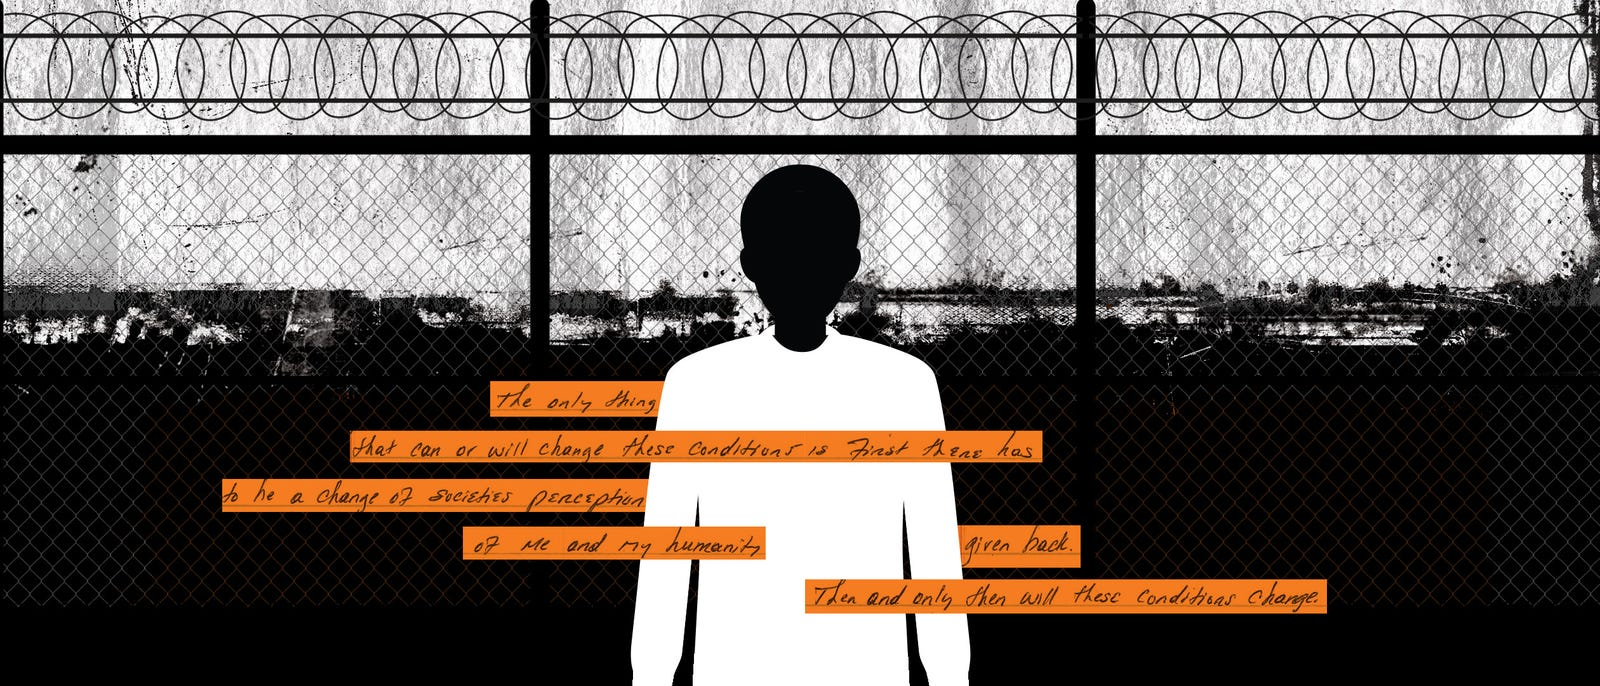 https://www.gannett-cdn.com/presto/2019/10/18/PMOY/0adcb7c0-887d-41fd-a588-90ca5bcf2944-prison_topper.jpg